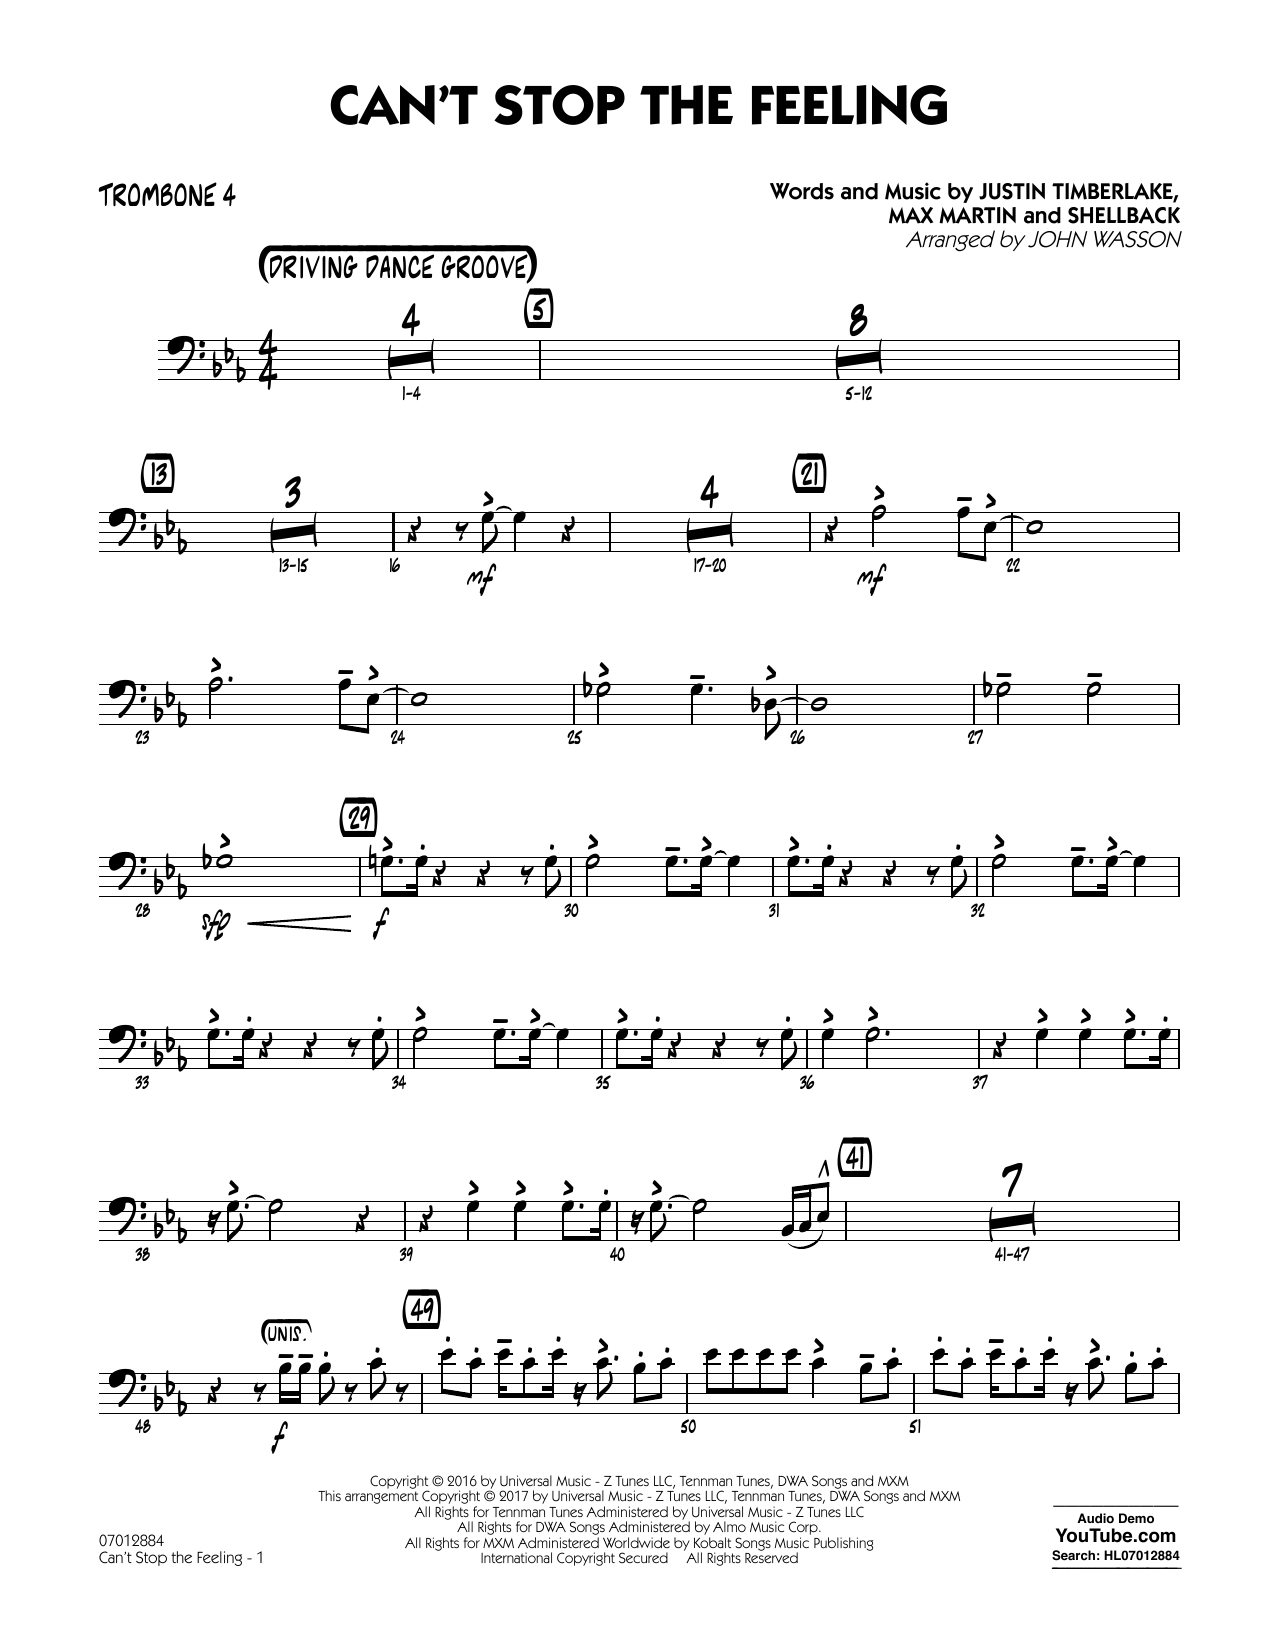 Can't Stop the Feeling - Trombone 4 Sheet Music